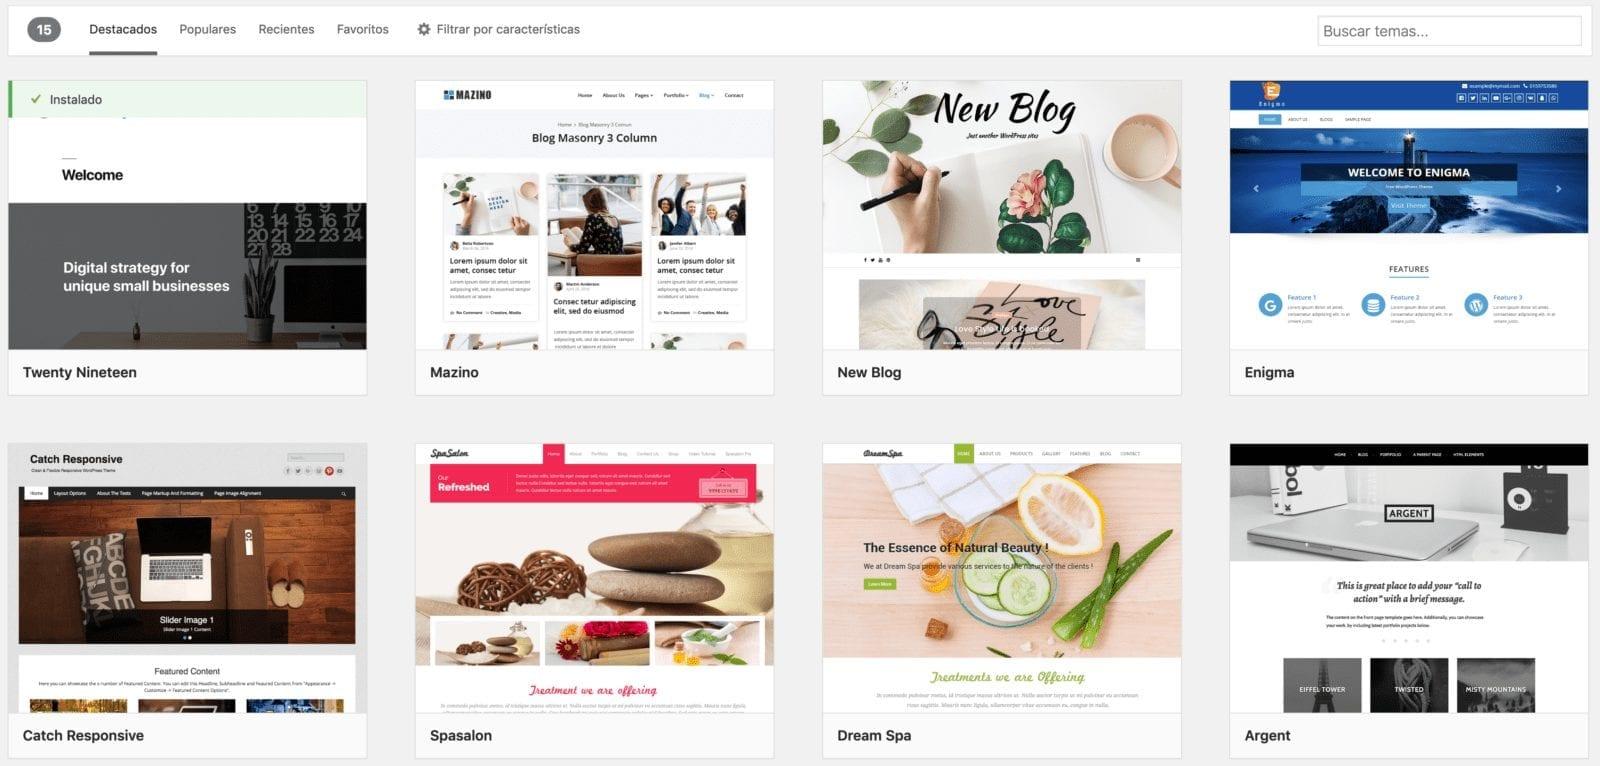 Descargar WordPress e instalar tema/plantilla